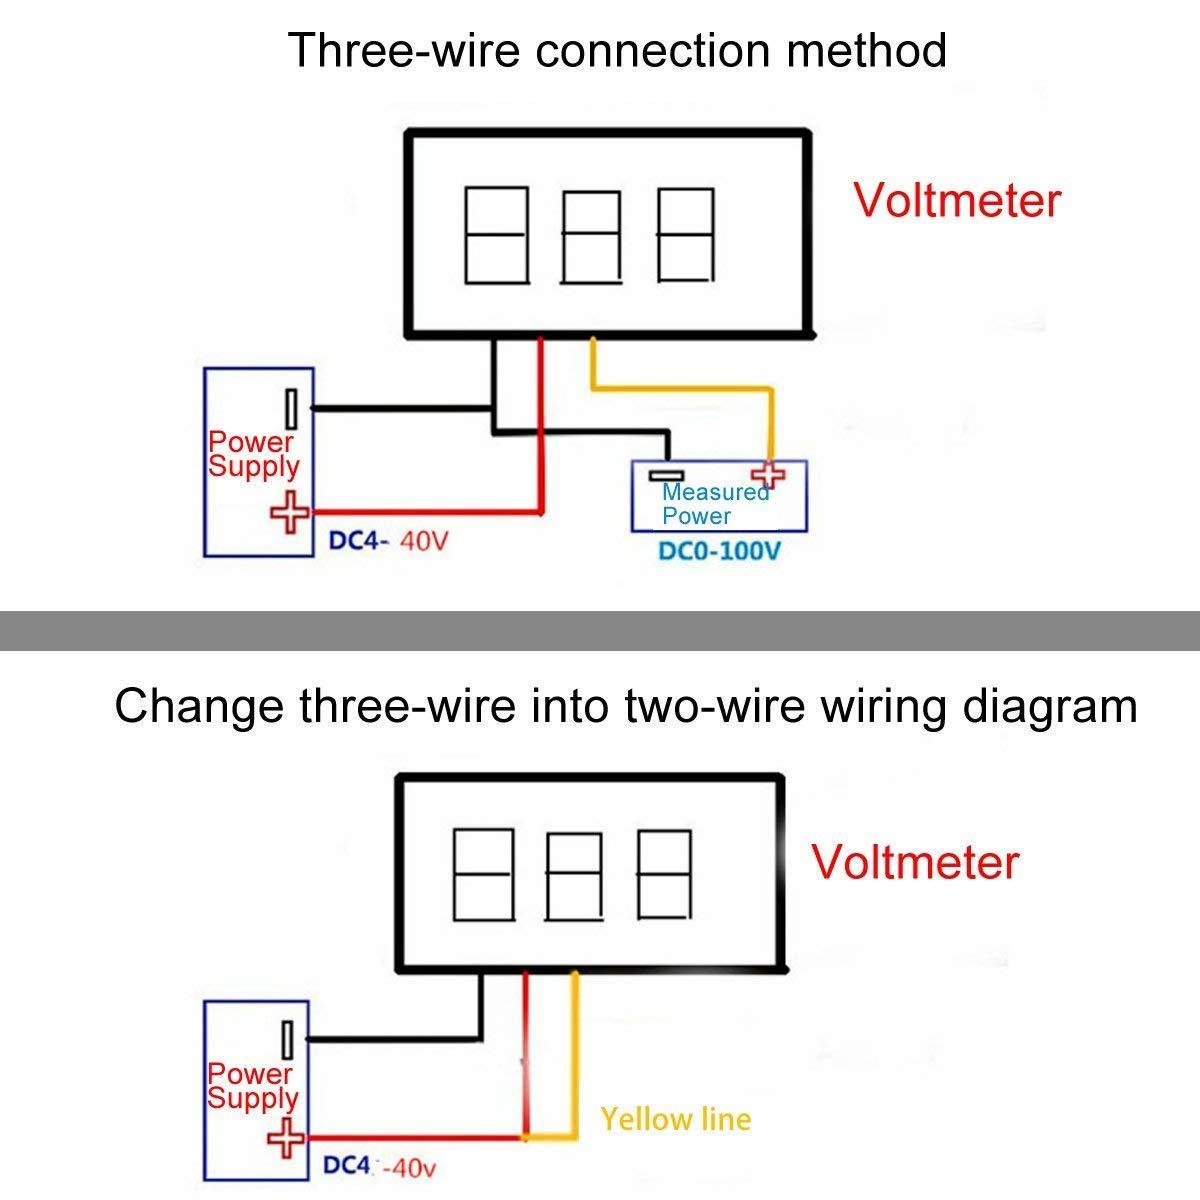 5 Pcs Mini Digital Voltmeter DC, Three-Line DC 0-100V Mini Digital Wiring Voltmeter on